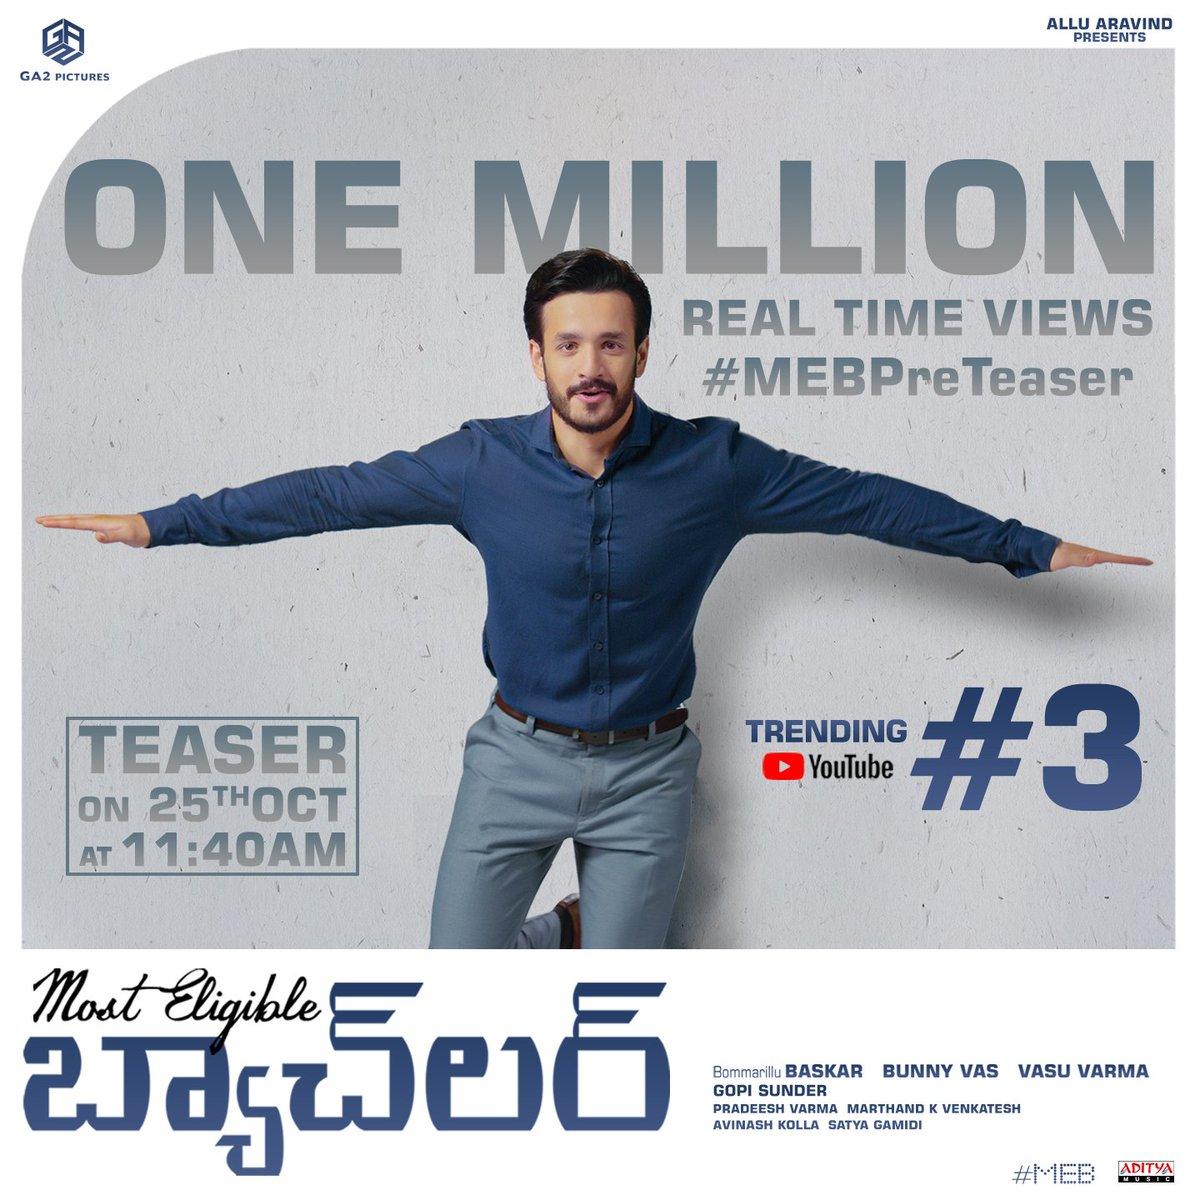 It's ONE MILLION+ Real time views for #MEBPreTeaser & Trending #3 on @YouTubeIndia  🔥🤩  ▶️    #MostEligibleBachelor #AlluAravind @AkhilAkkineni8 @hegdepooja @baskifilmz @GopiSundarOffl #BunnyVas #VasuVarma @GA2Official @adityamusic